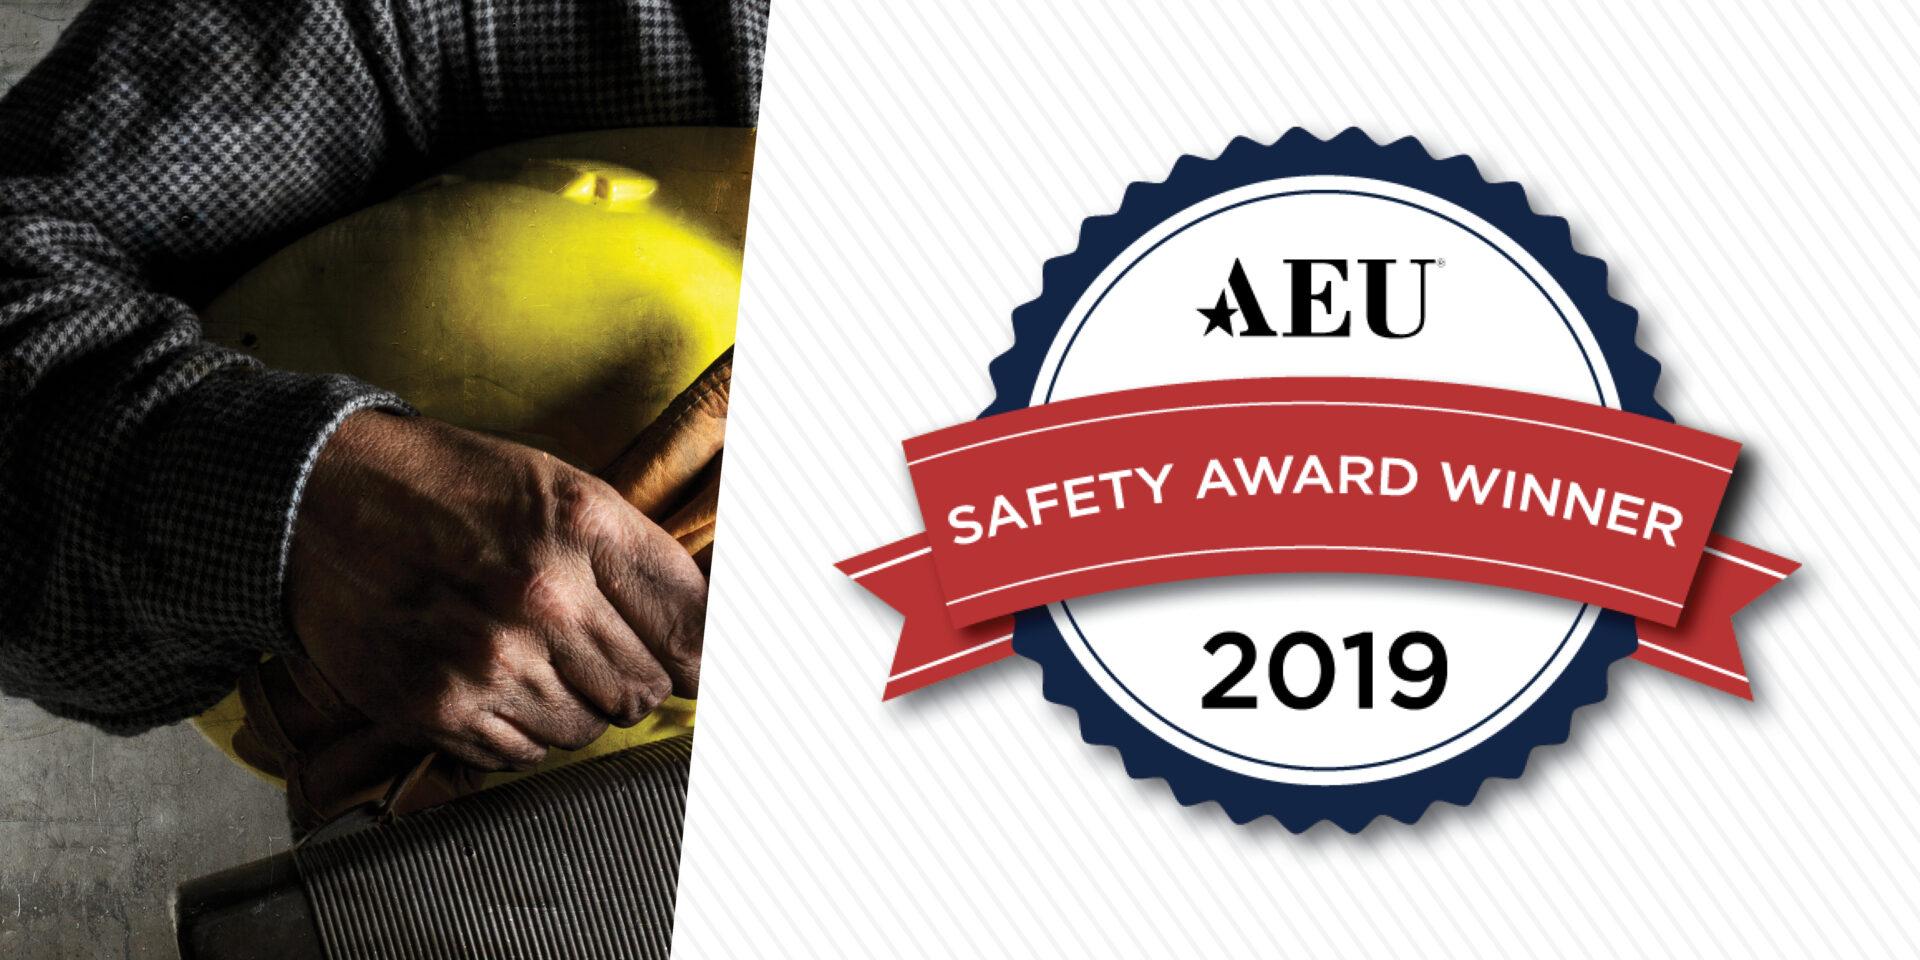 7.-Template-Safety-Award-Winner-Social-Image-1